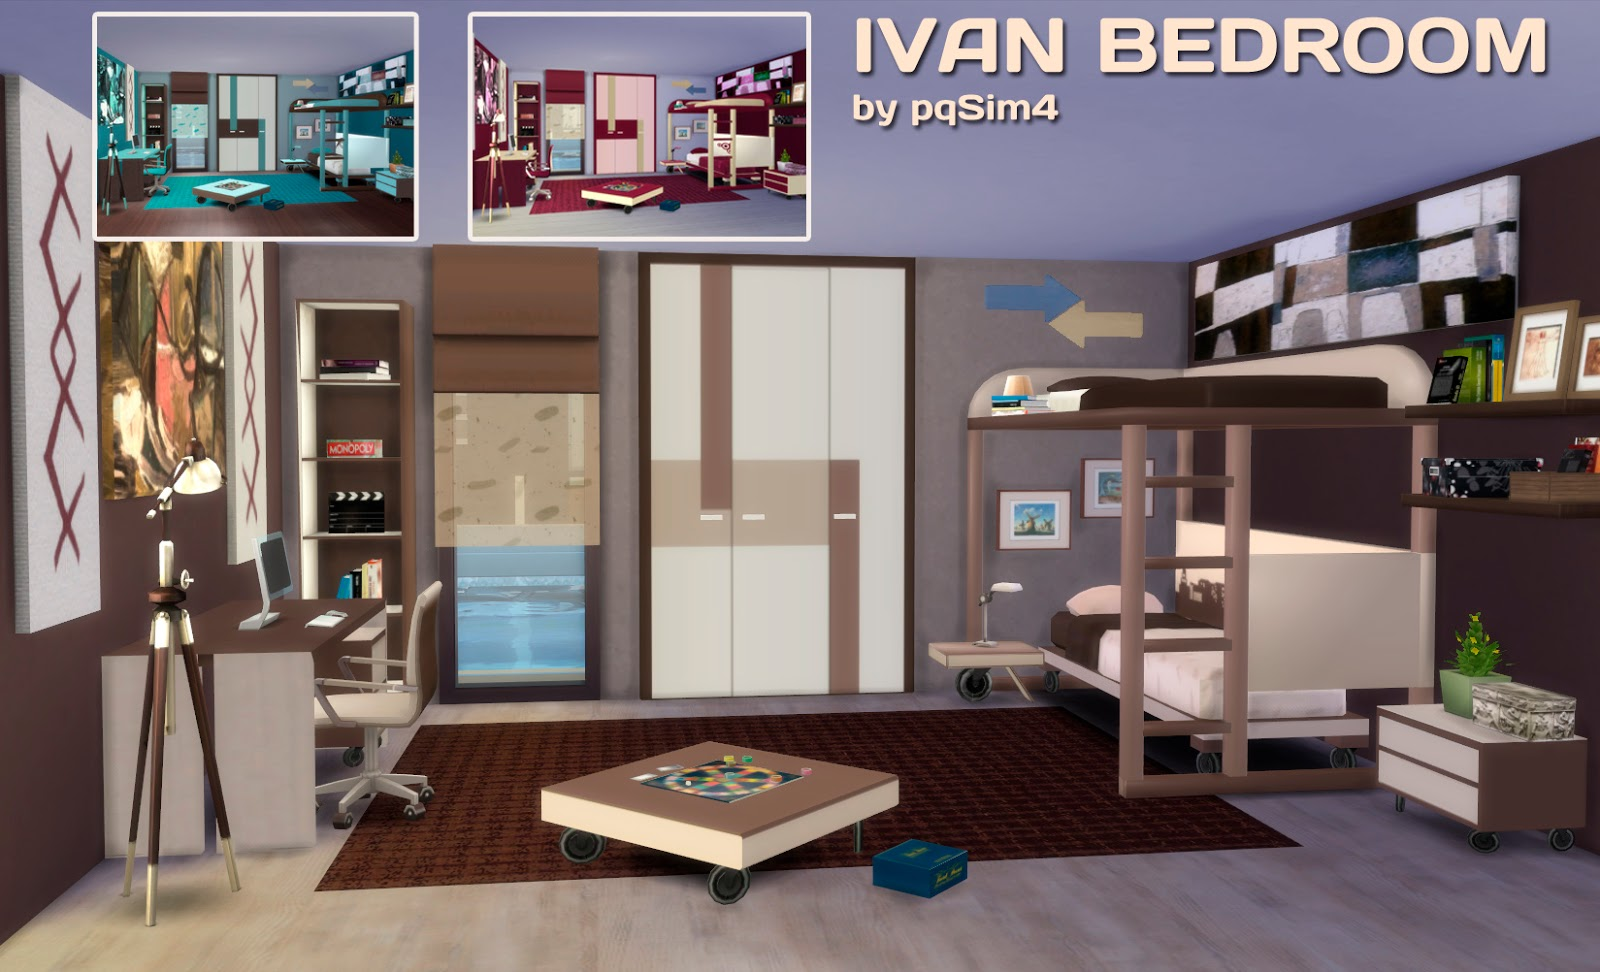 my sims 4 blog ivan bedroom set by pqsim4